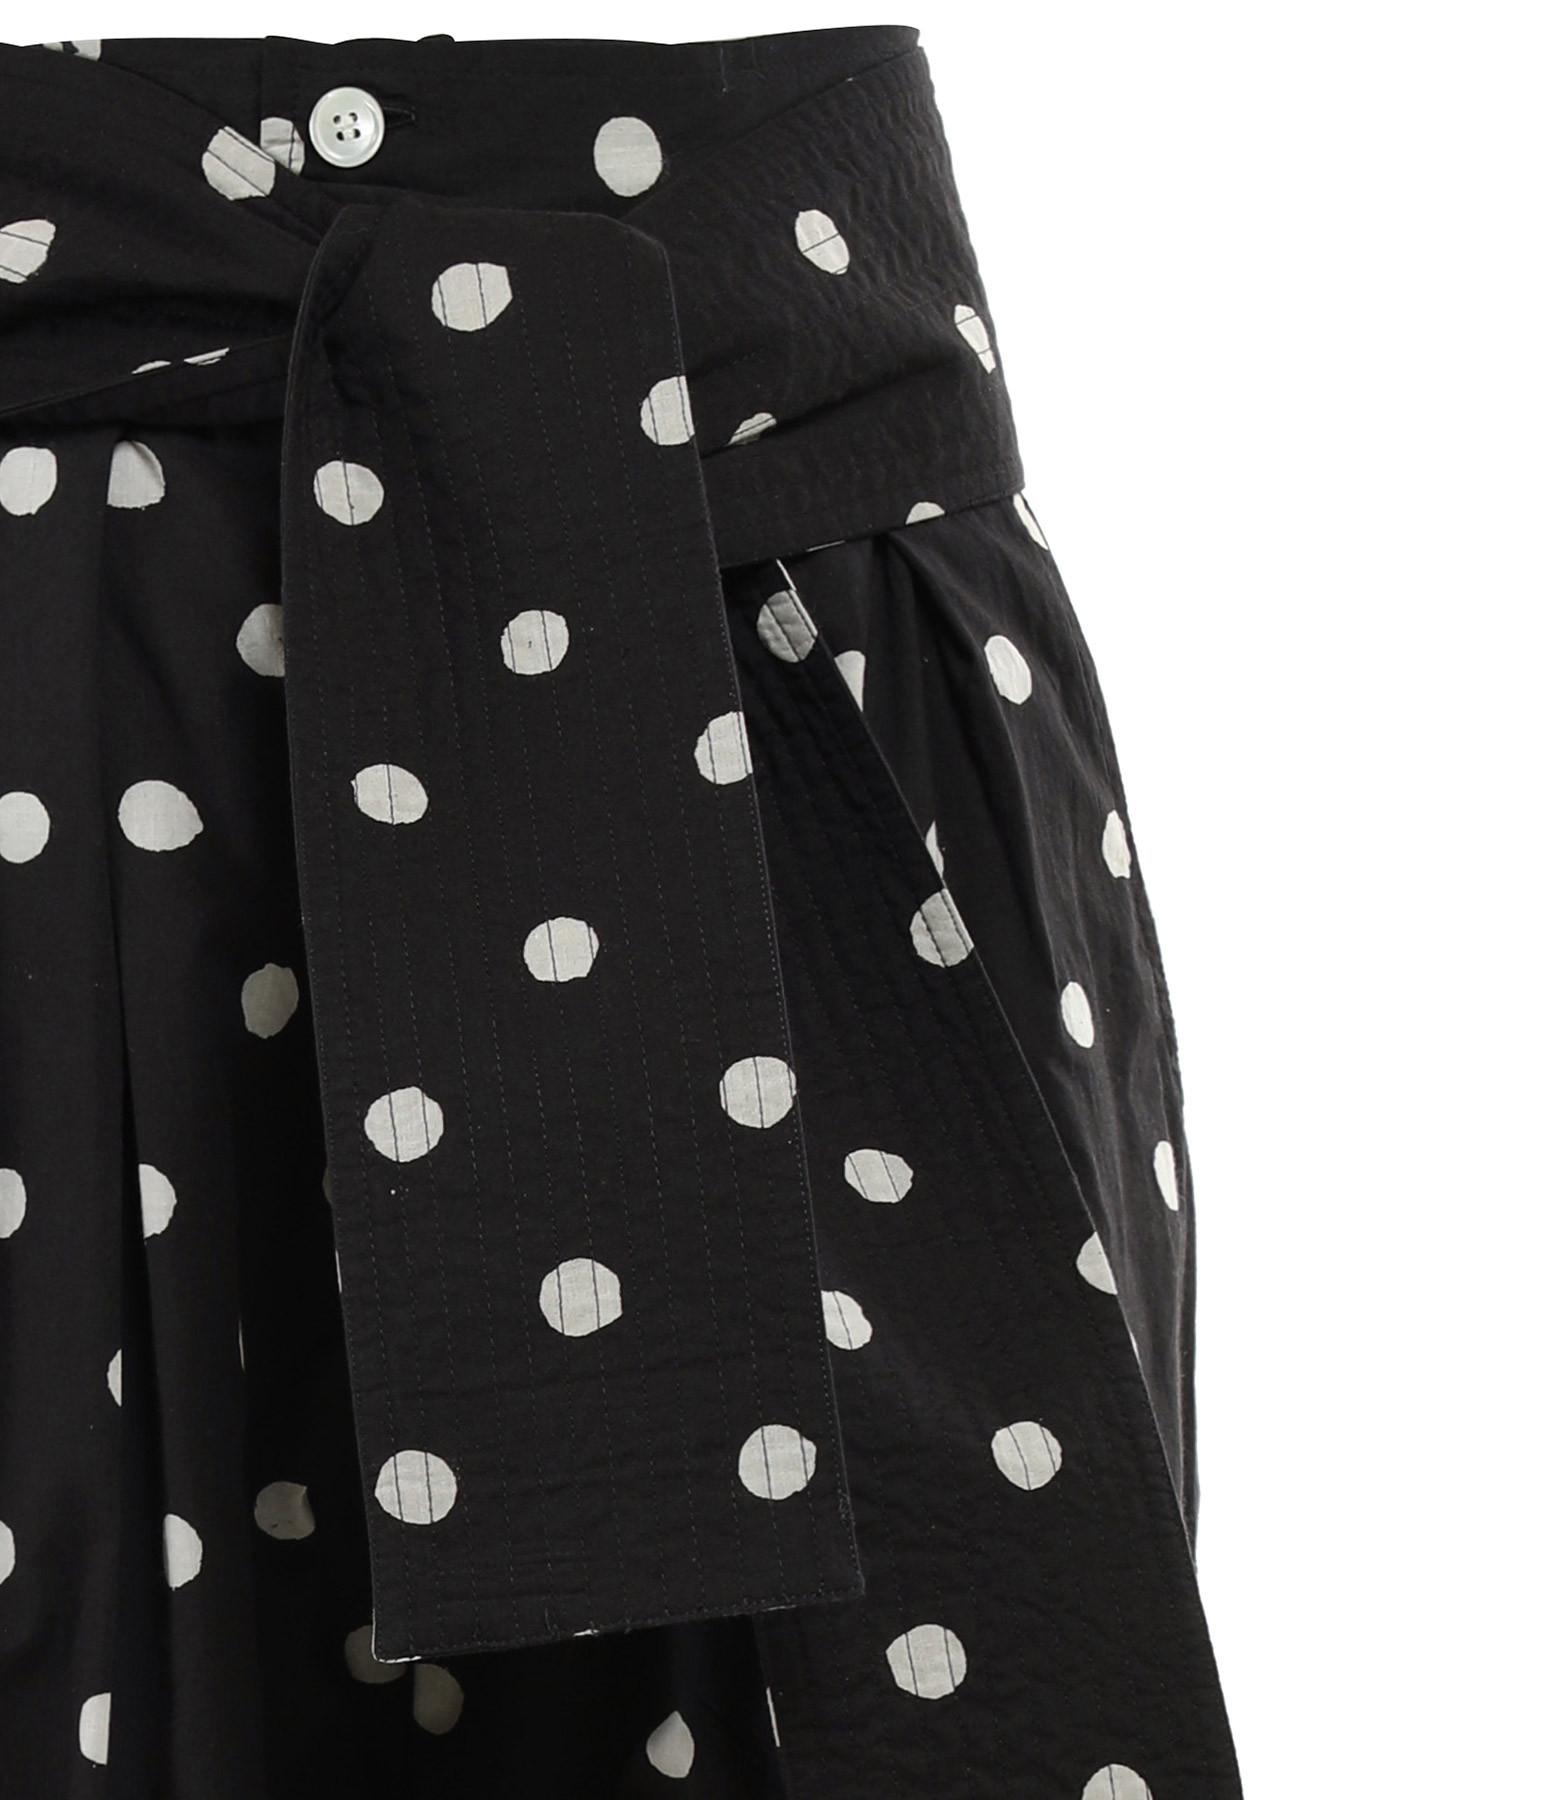 LAURENCE BRAS - Pantalon Mojito Coton Pois Noir